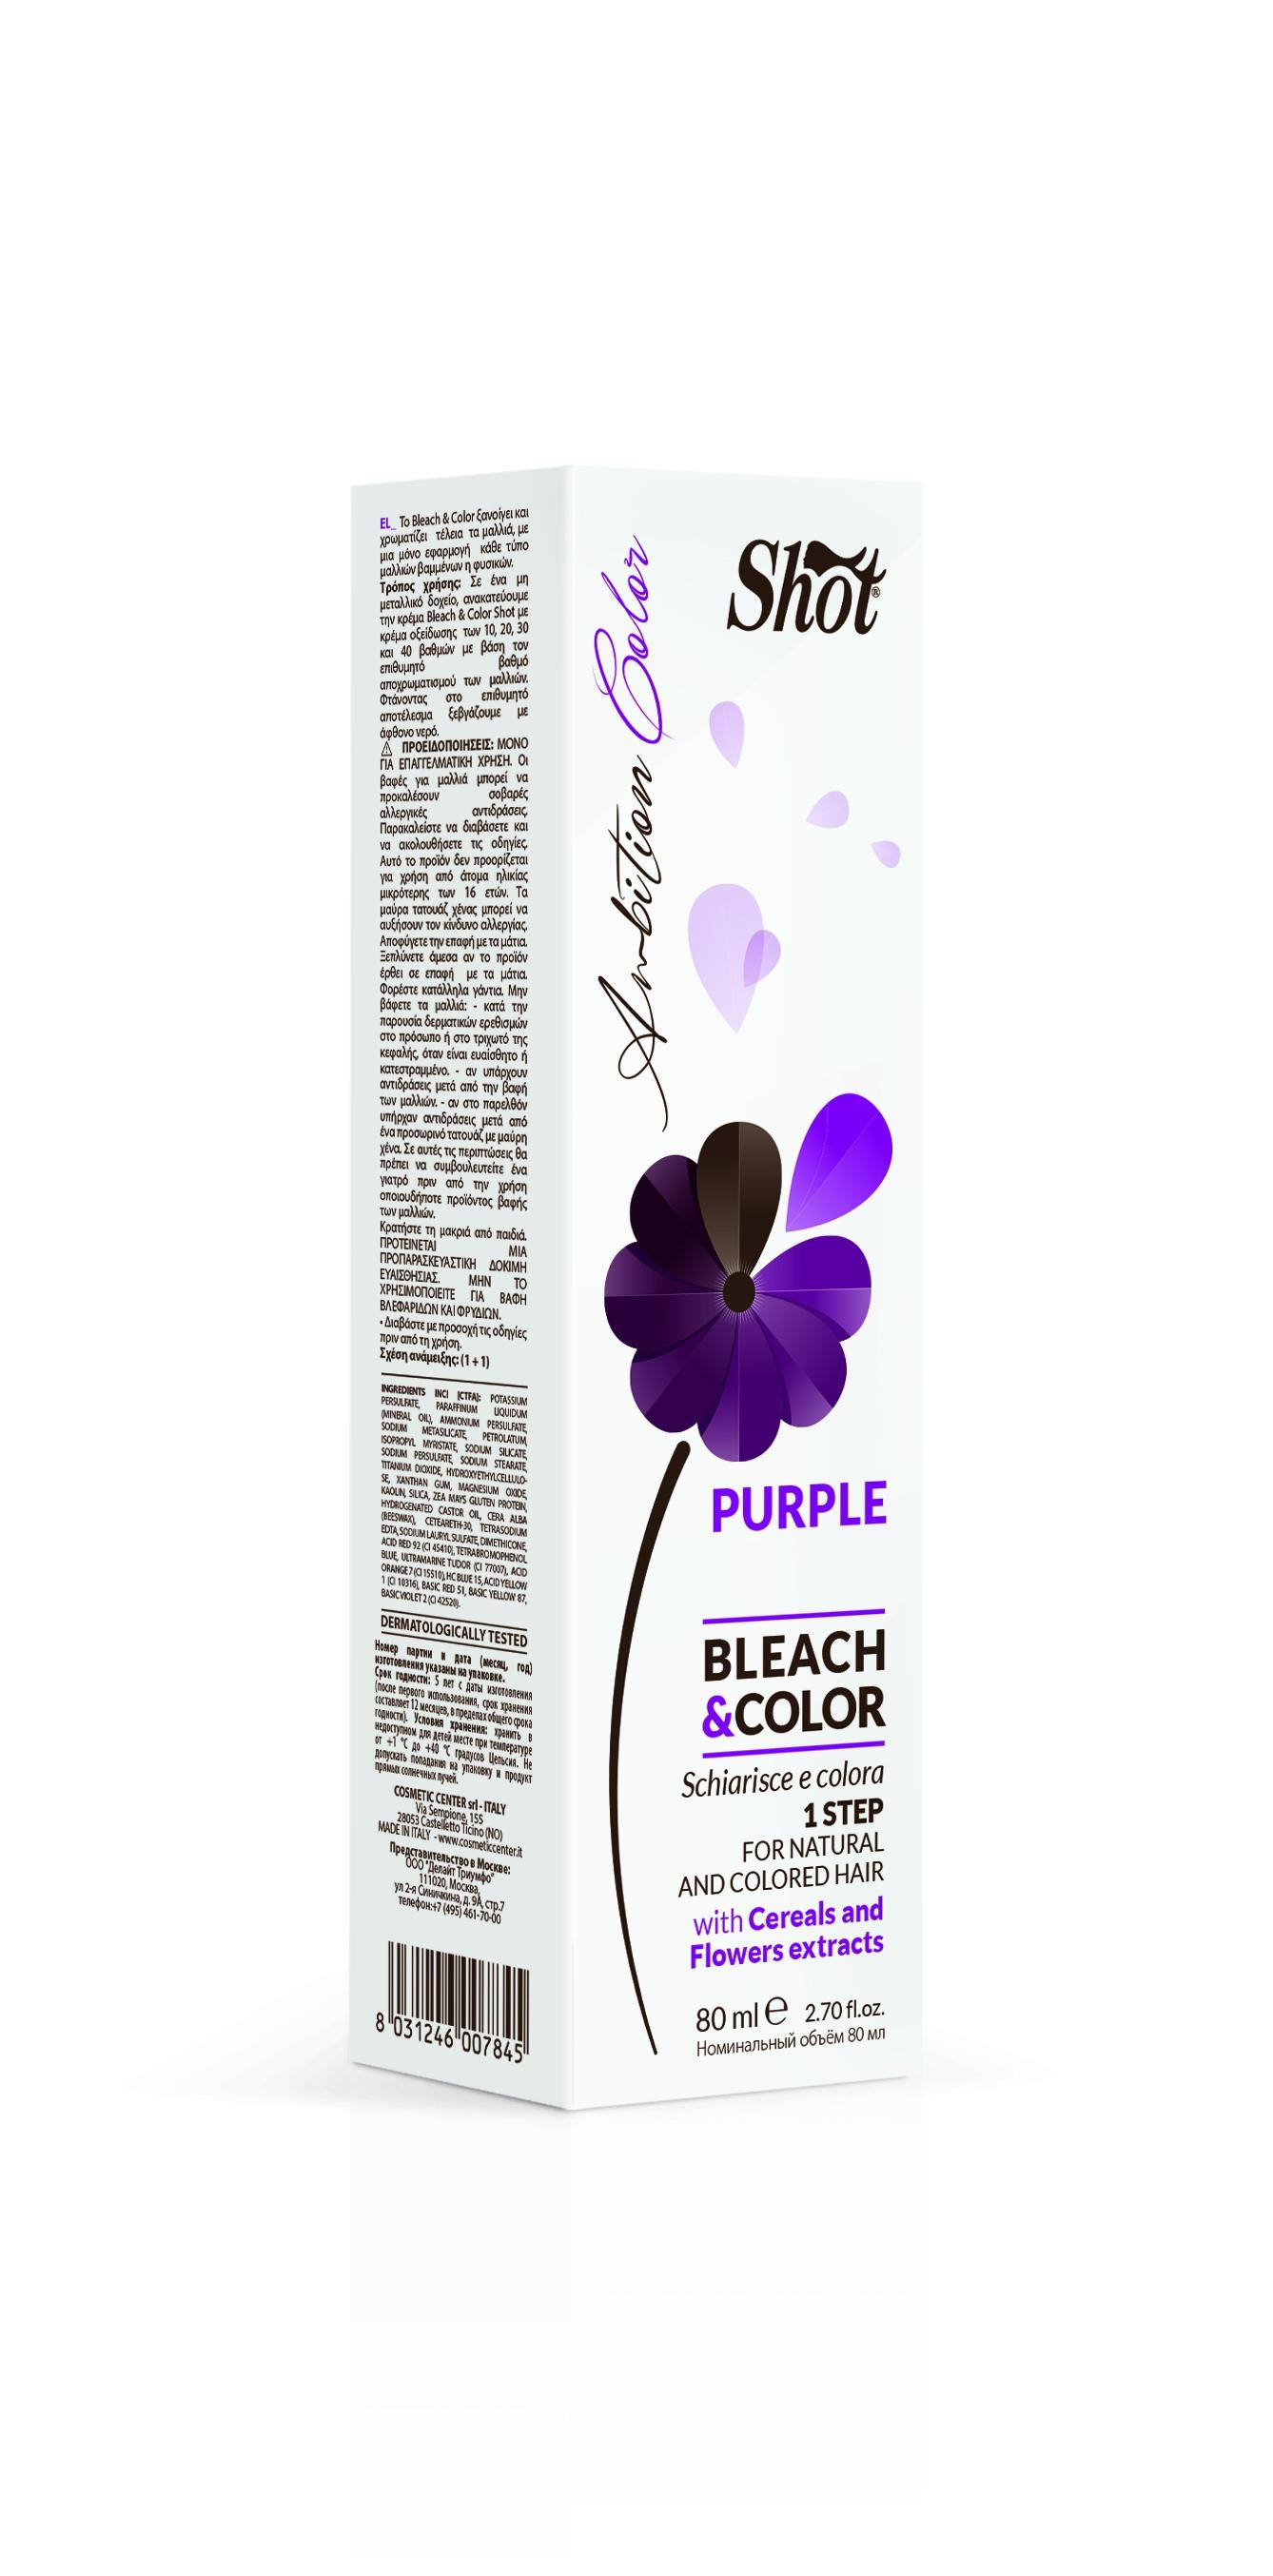 Фото - SHOT Обесцвечивающий Крем с Пигментом Пурпурный Bleach & Color, 80 мл faux pearl frayed bleach wash denim jacket